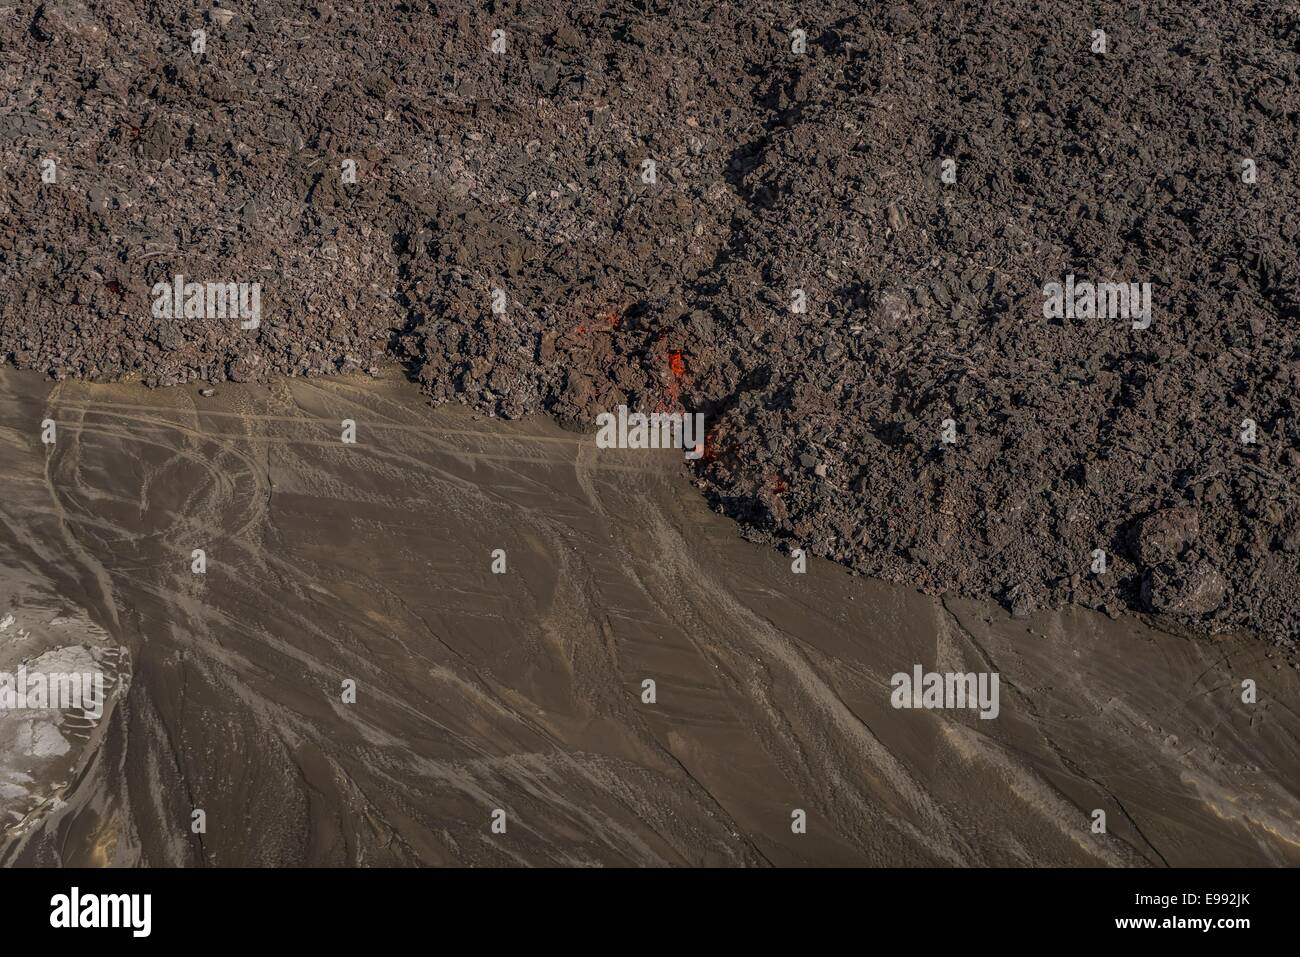 Lava flow with tire tracks, Holuhraun Fissure Eruption, near the Bardarbunga Volcano, Iceland. - Stock Image